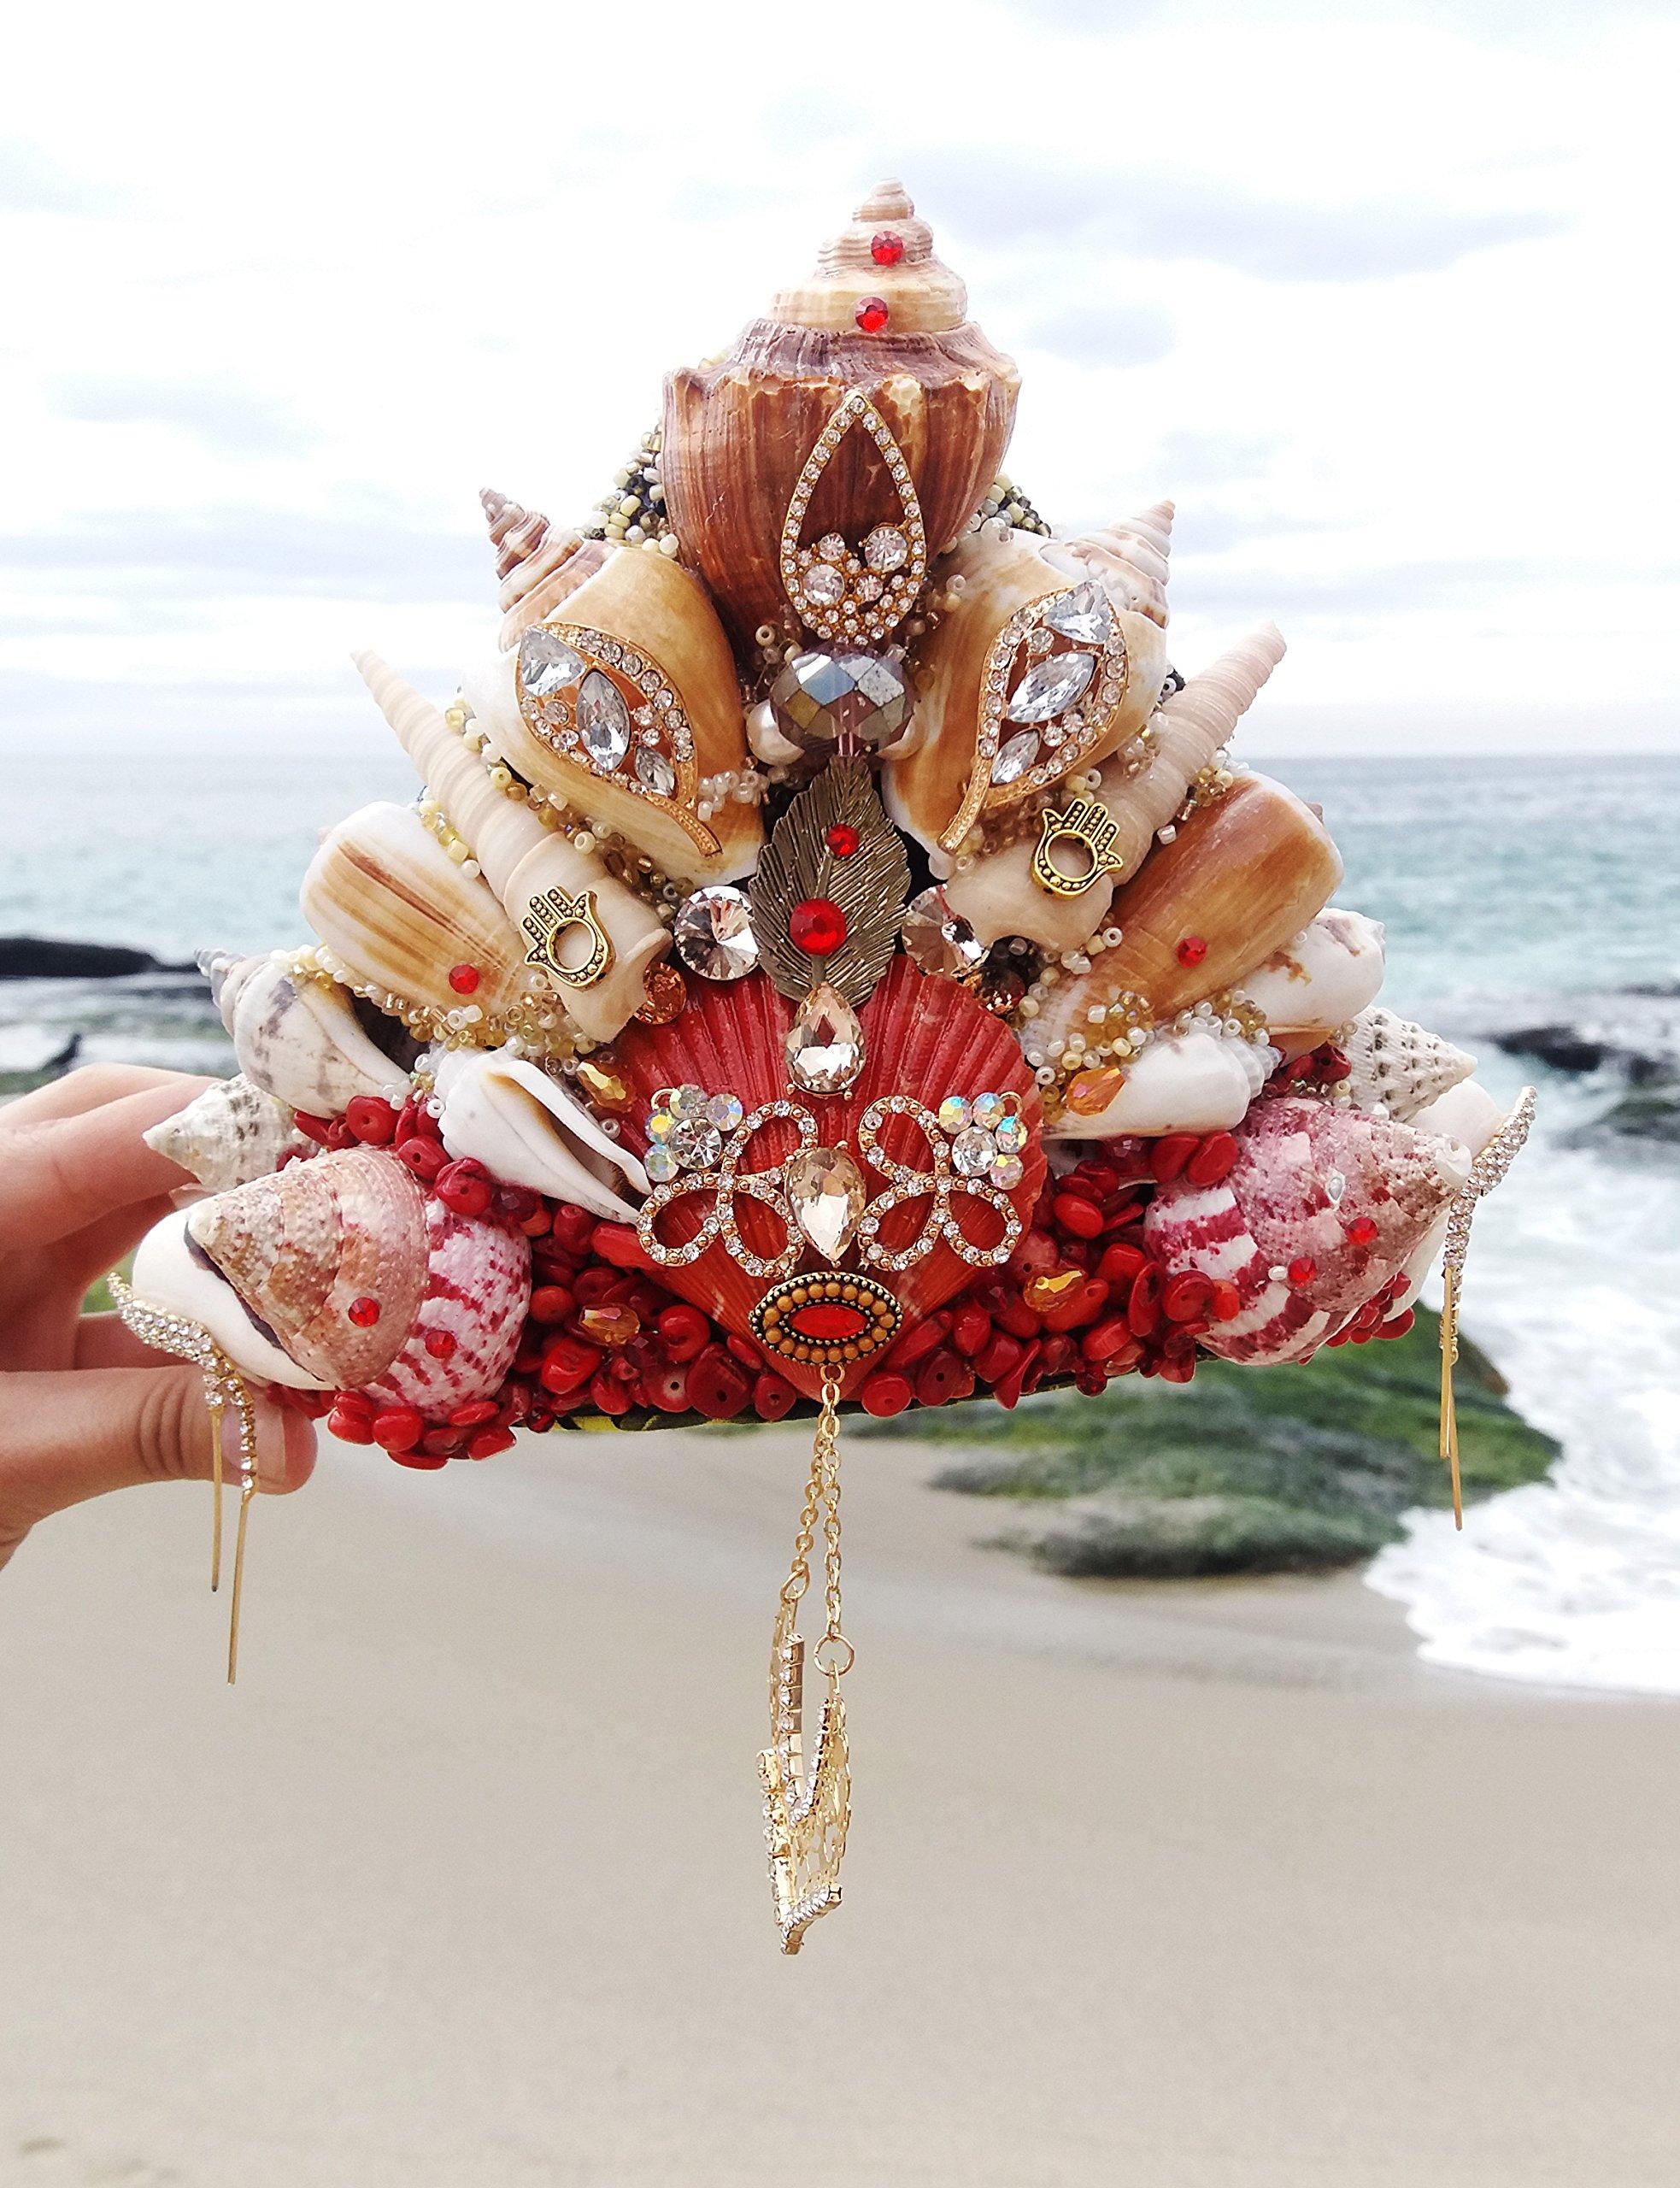 Easter Sale Red Coral Gold Mermaid Crown by Star Stuff Boutique Mermaid Headress, Gold Headdress, High Energy Mermraid Headpiece, Seashell Tiara